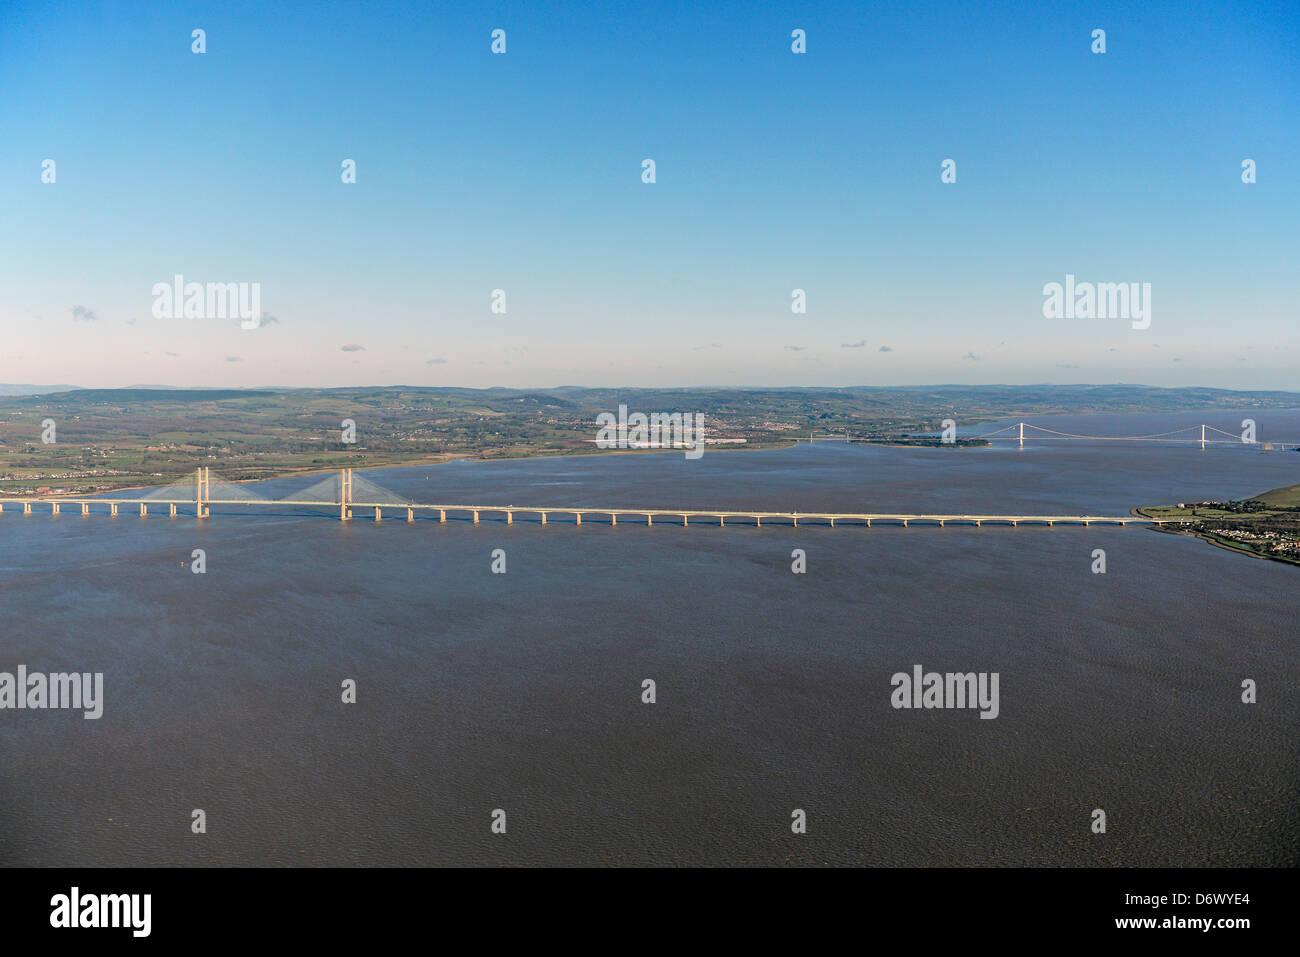 Aerial photograph of Both Severn bridges across the Severn Estuary - Stock Image